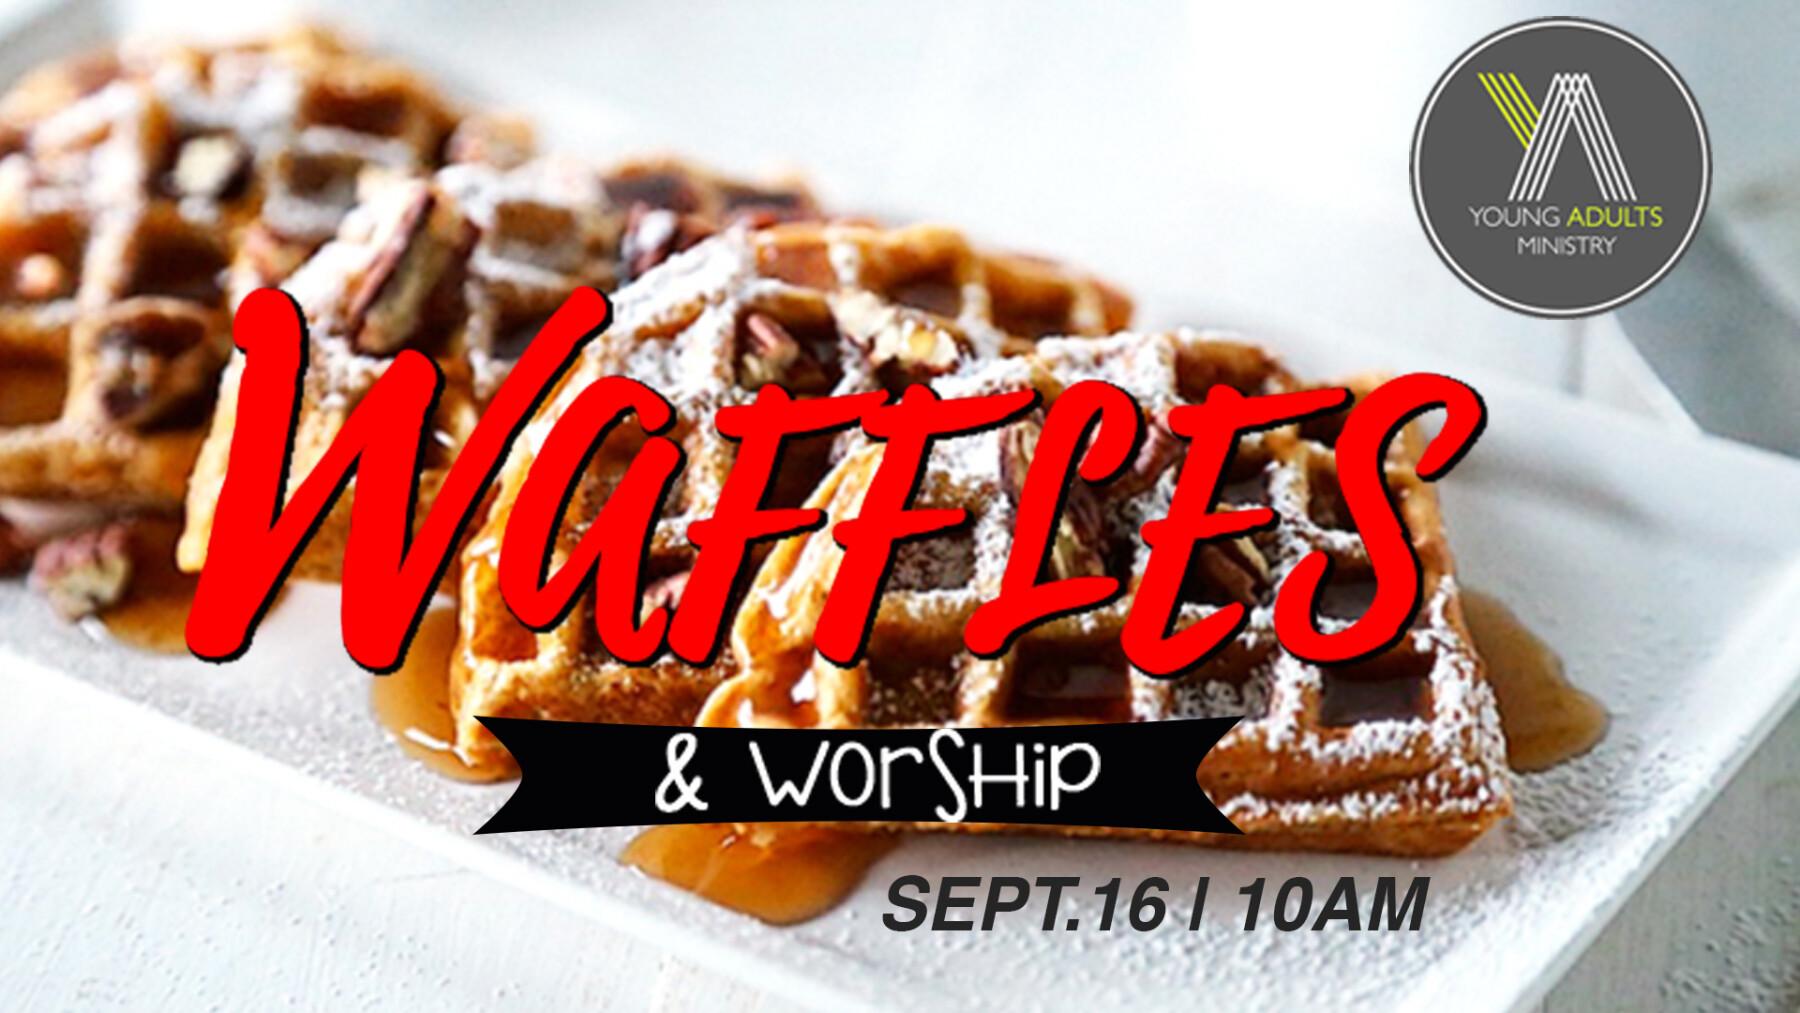 Waffles & Worship